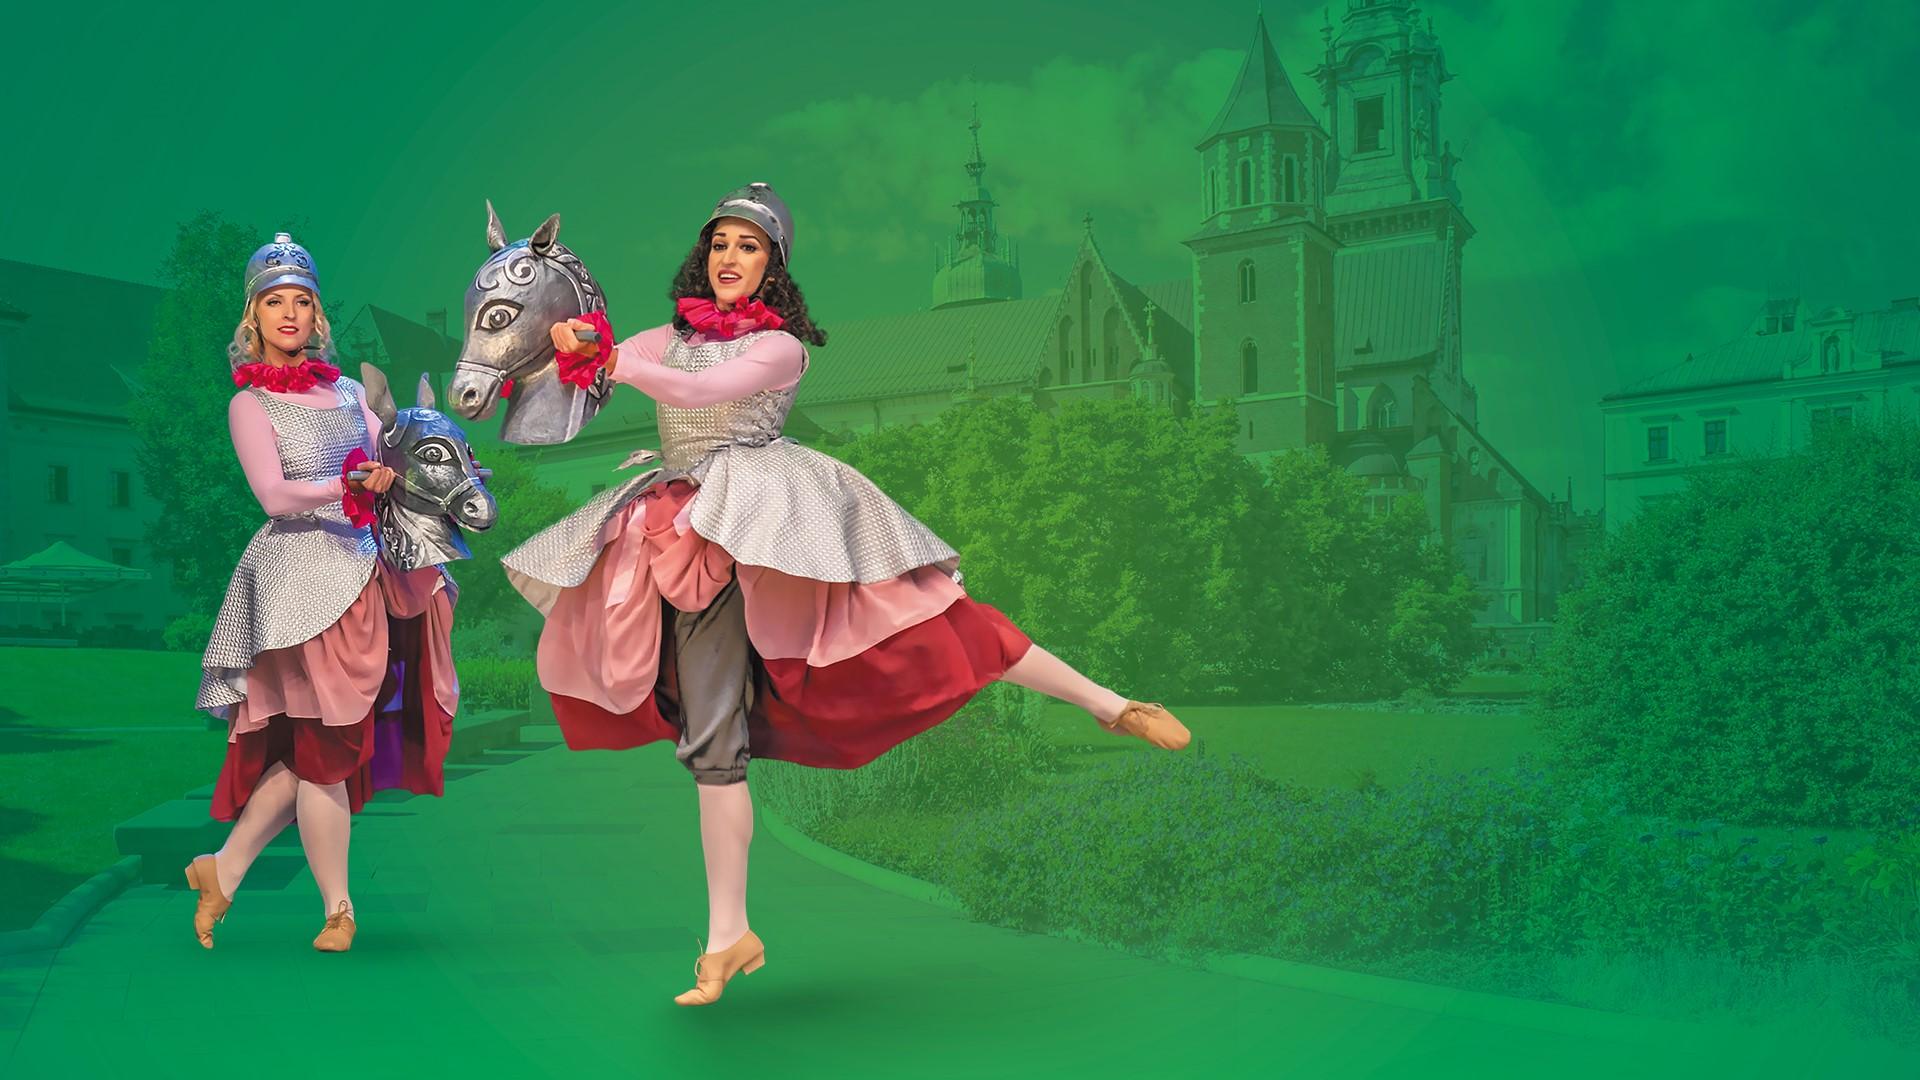 22. Cracovia Danza Court Dance Festival 19-31 July 2021, Kraków: Main Market, Wawel, Collegium Maius, Willa Decjusza